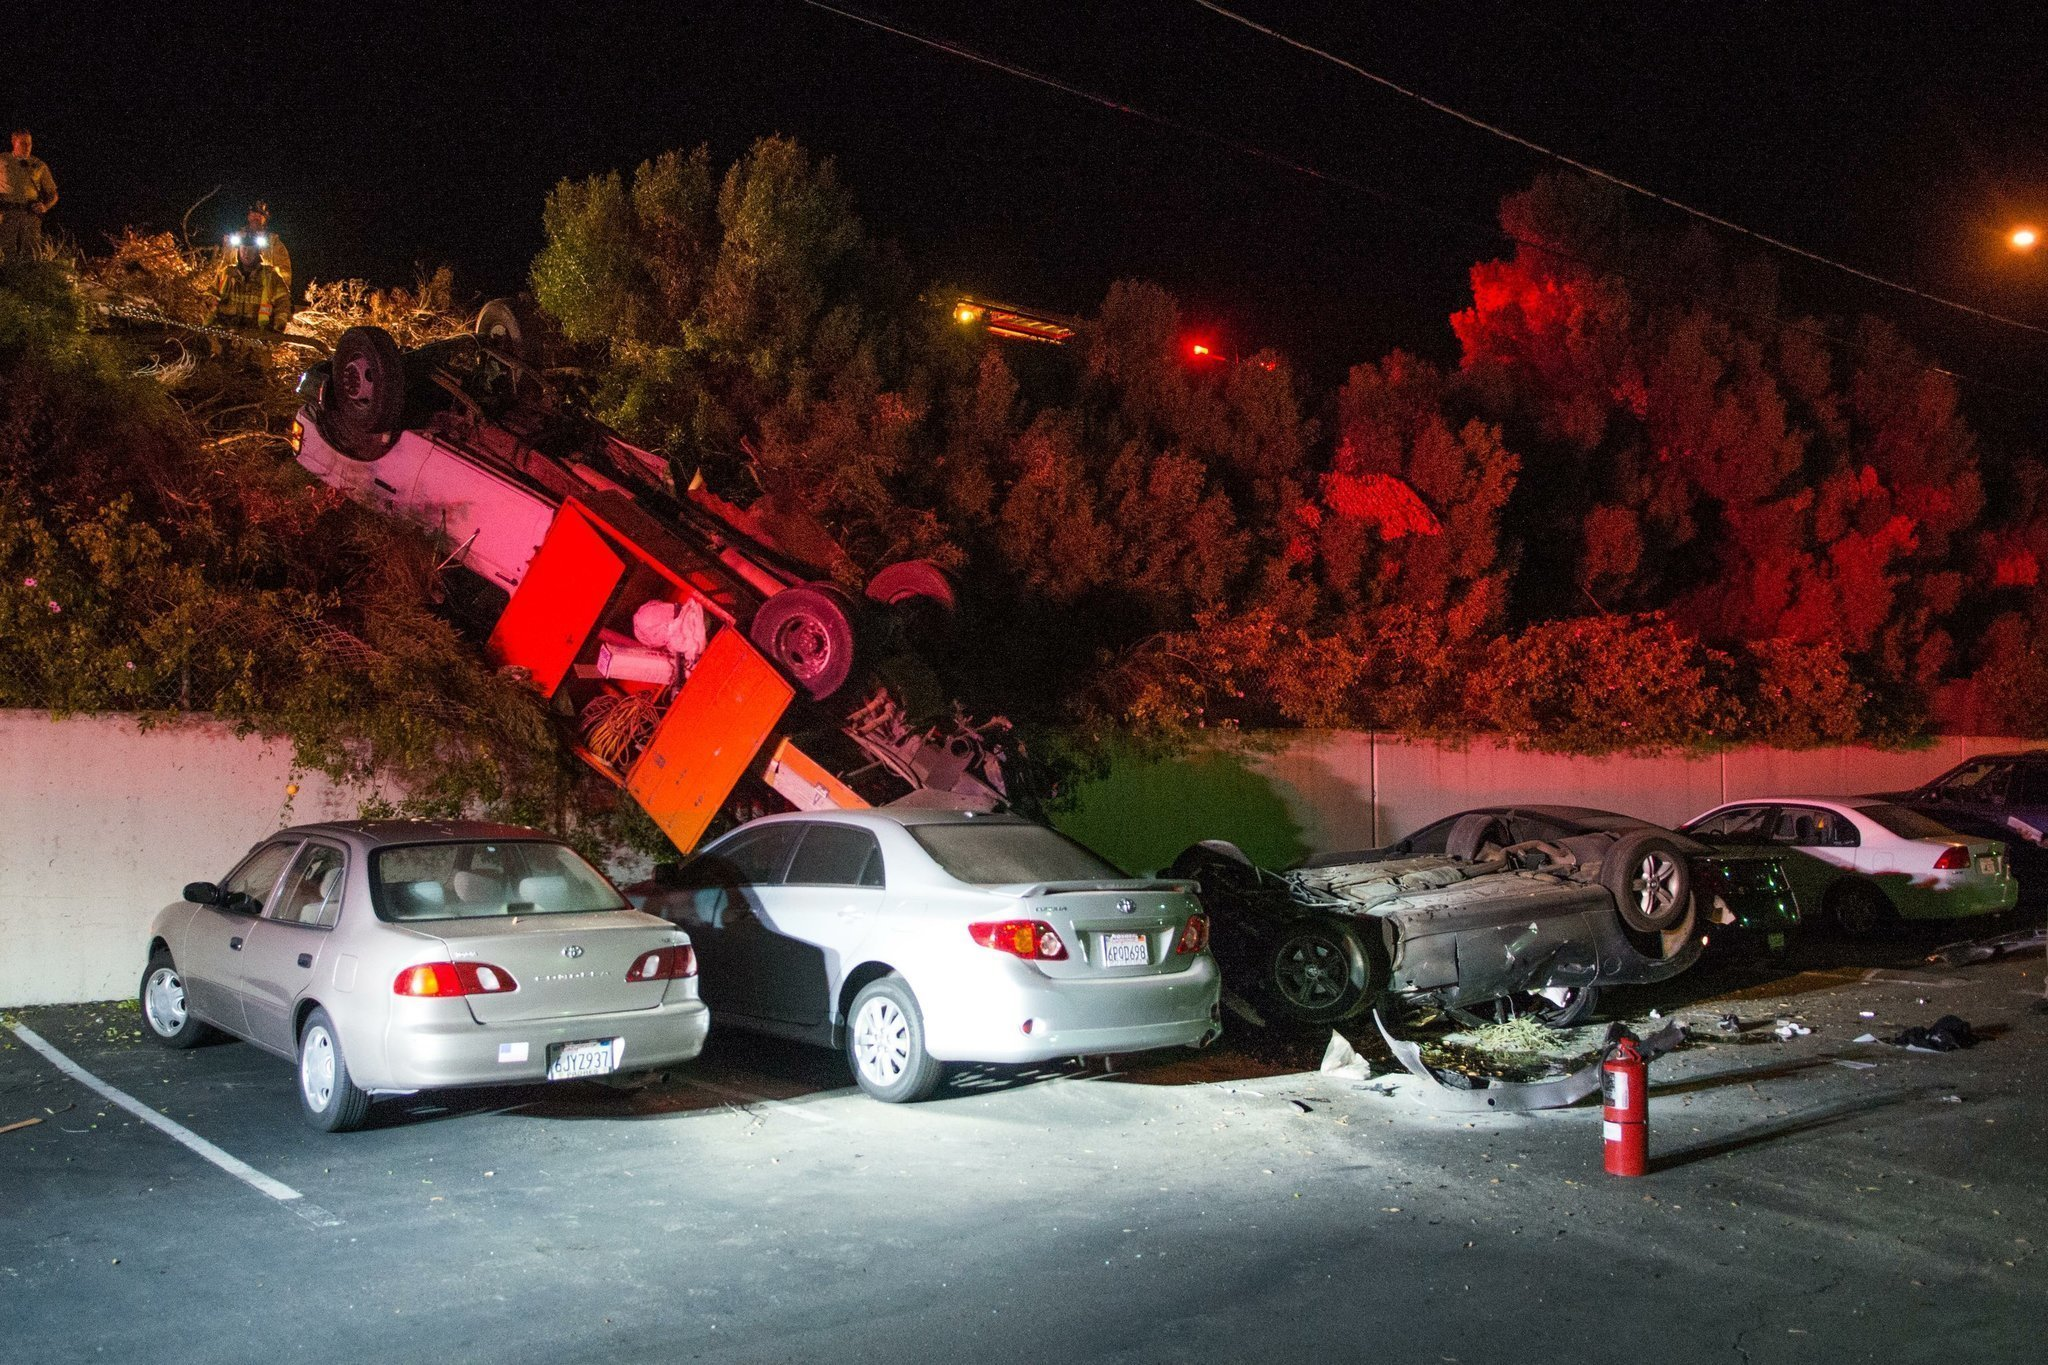 Truck Car Fly Off I 5 In Fiery Crash The San Diego Union Tribune